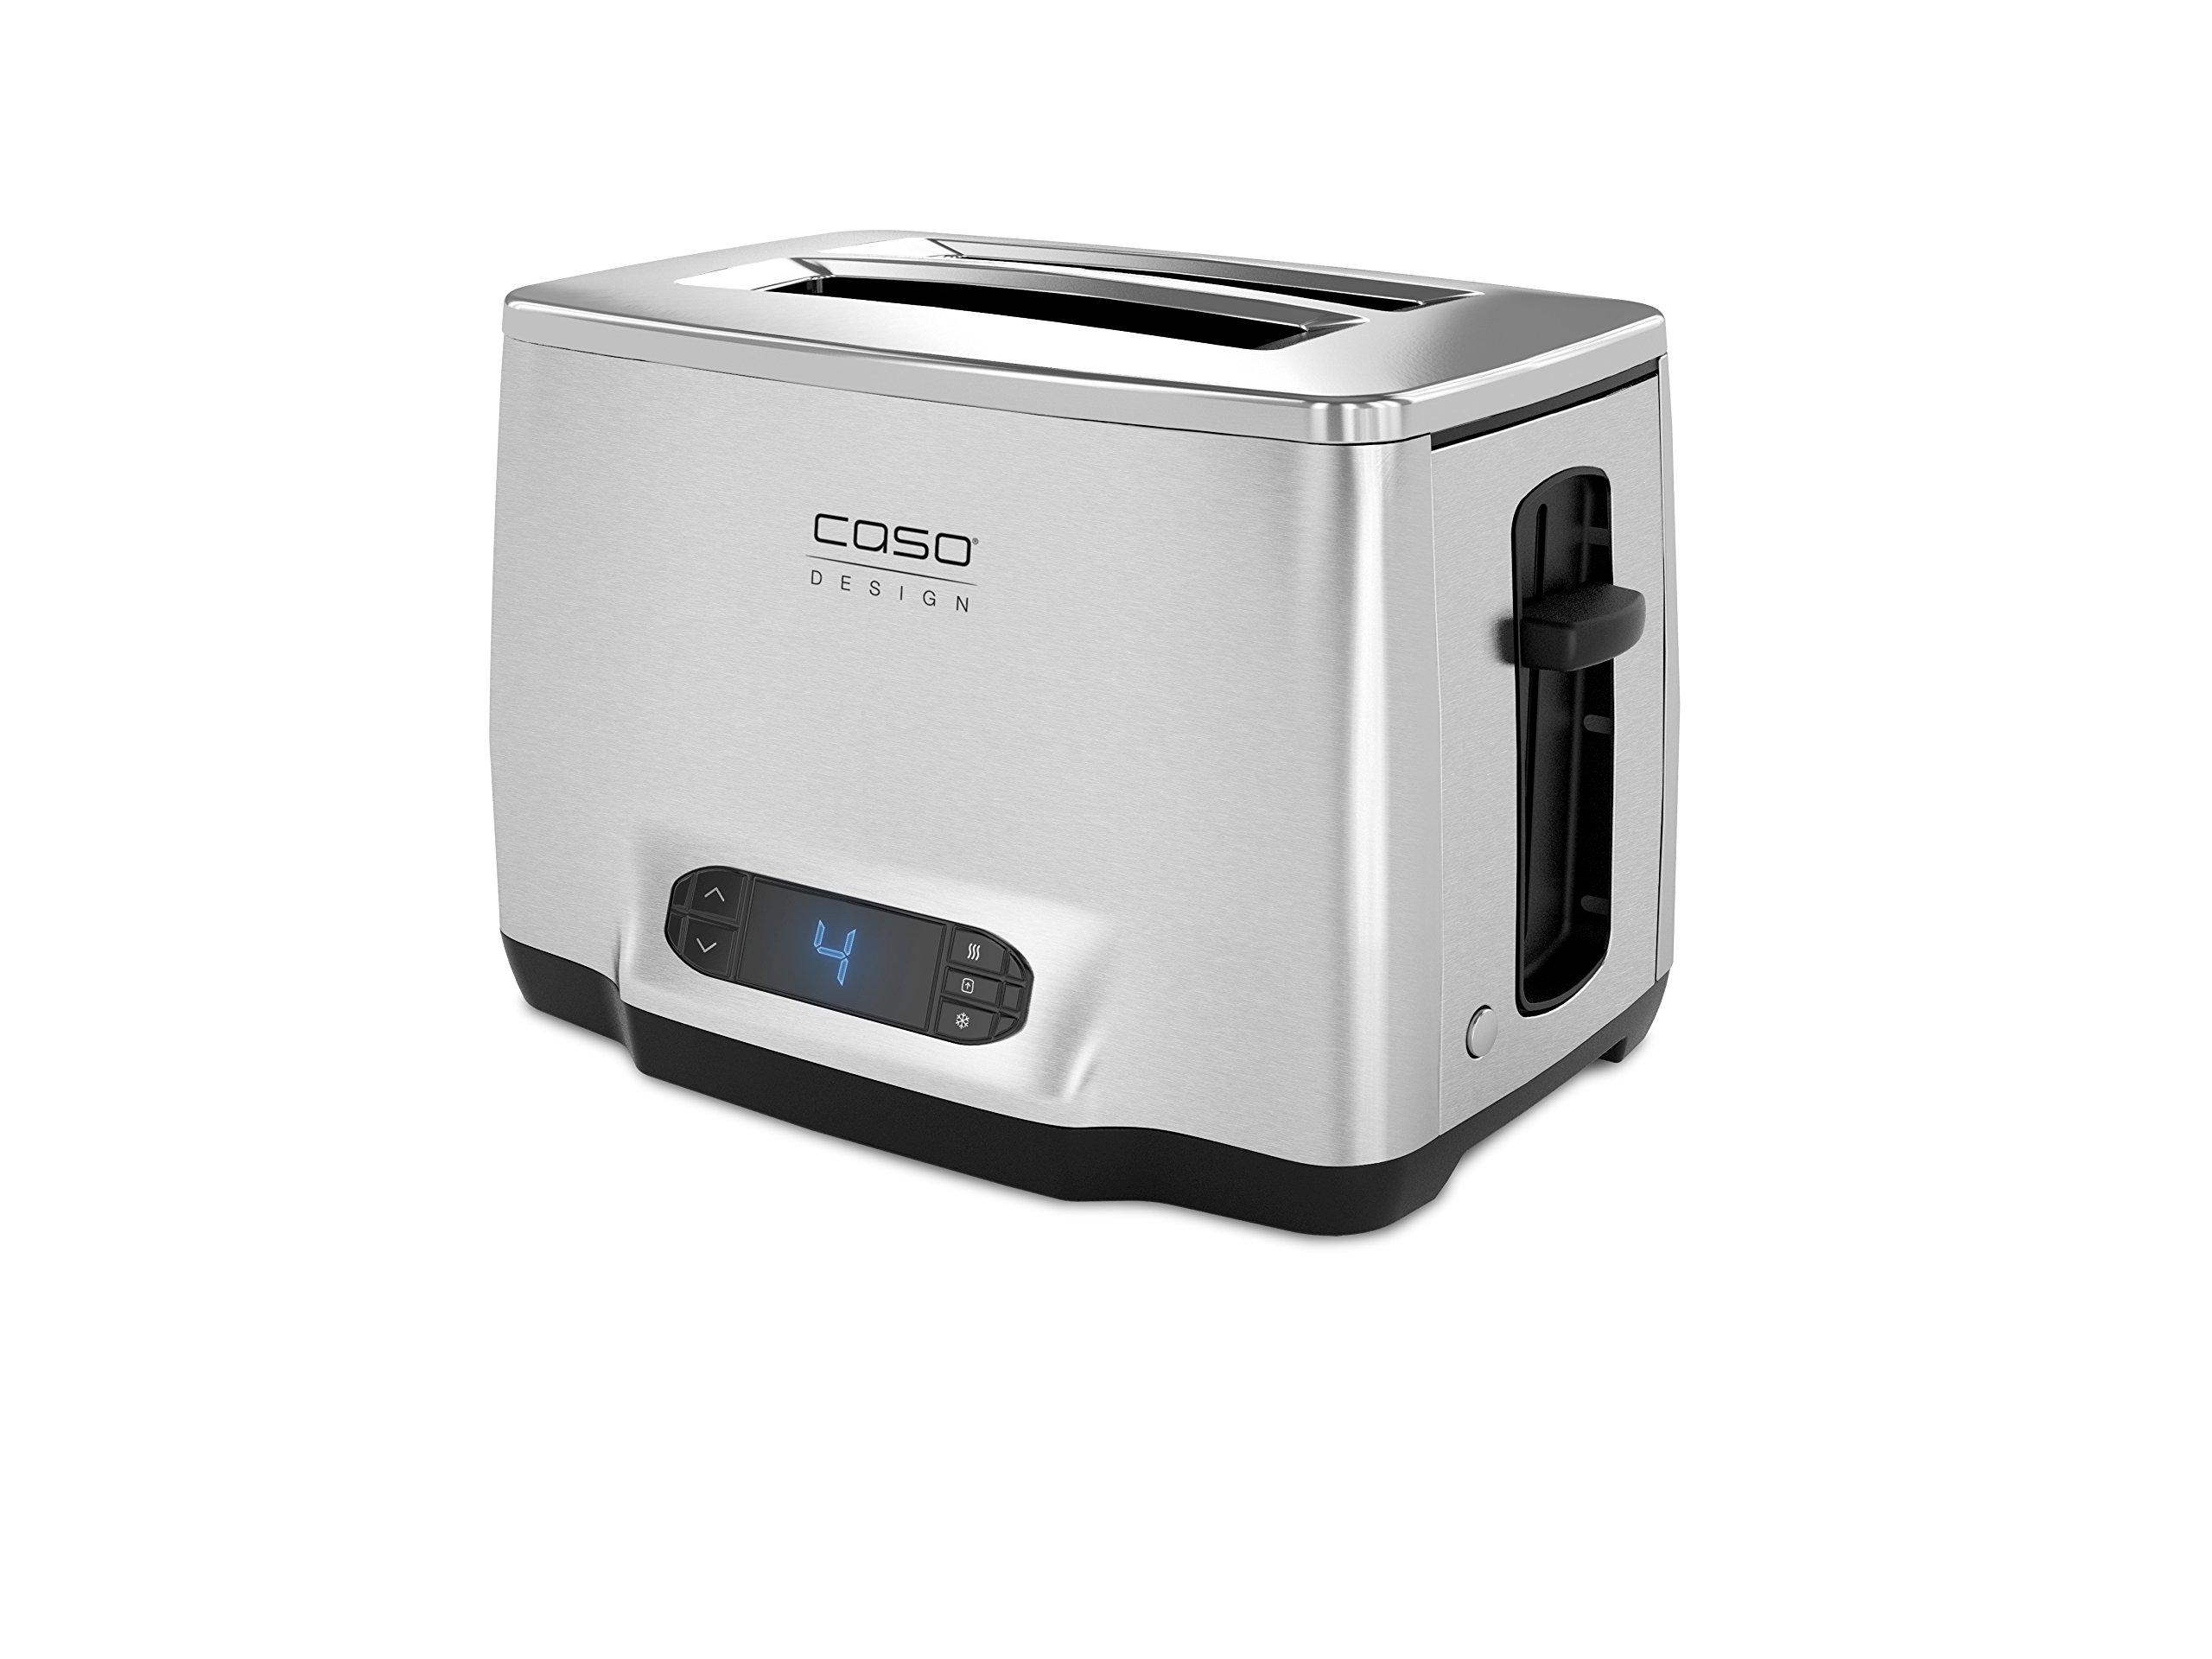 Caso-Inox-Design-Toaster-aus-hochwertigem-Edelstahl-Toastautomatik-extra-groes-LCD-Display-silber